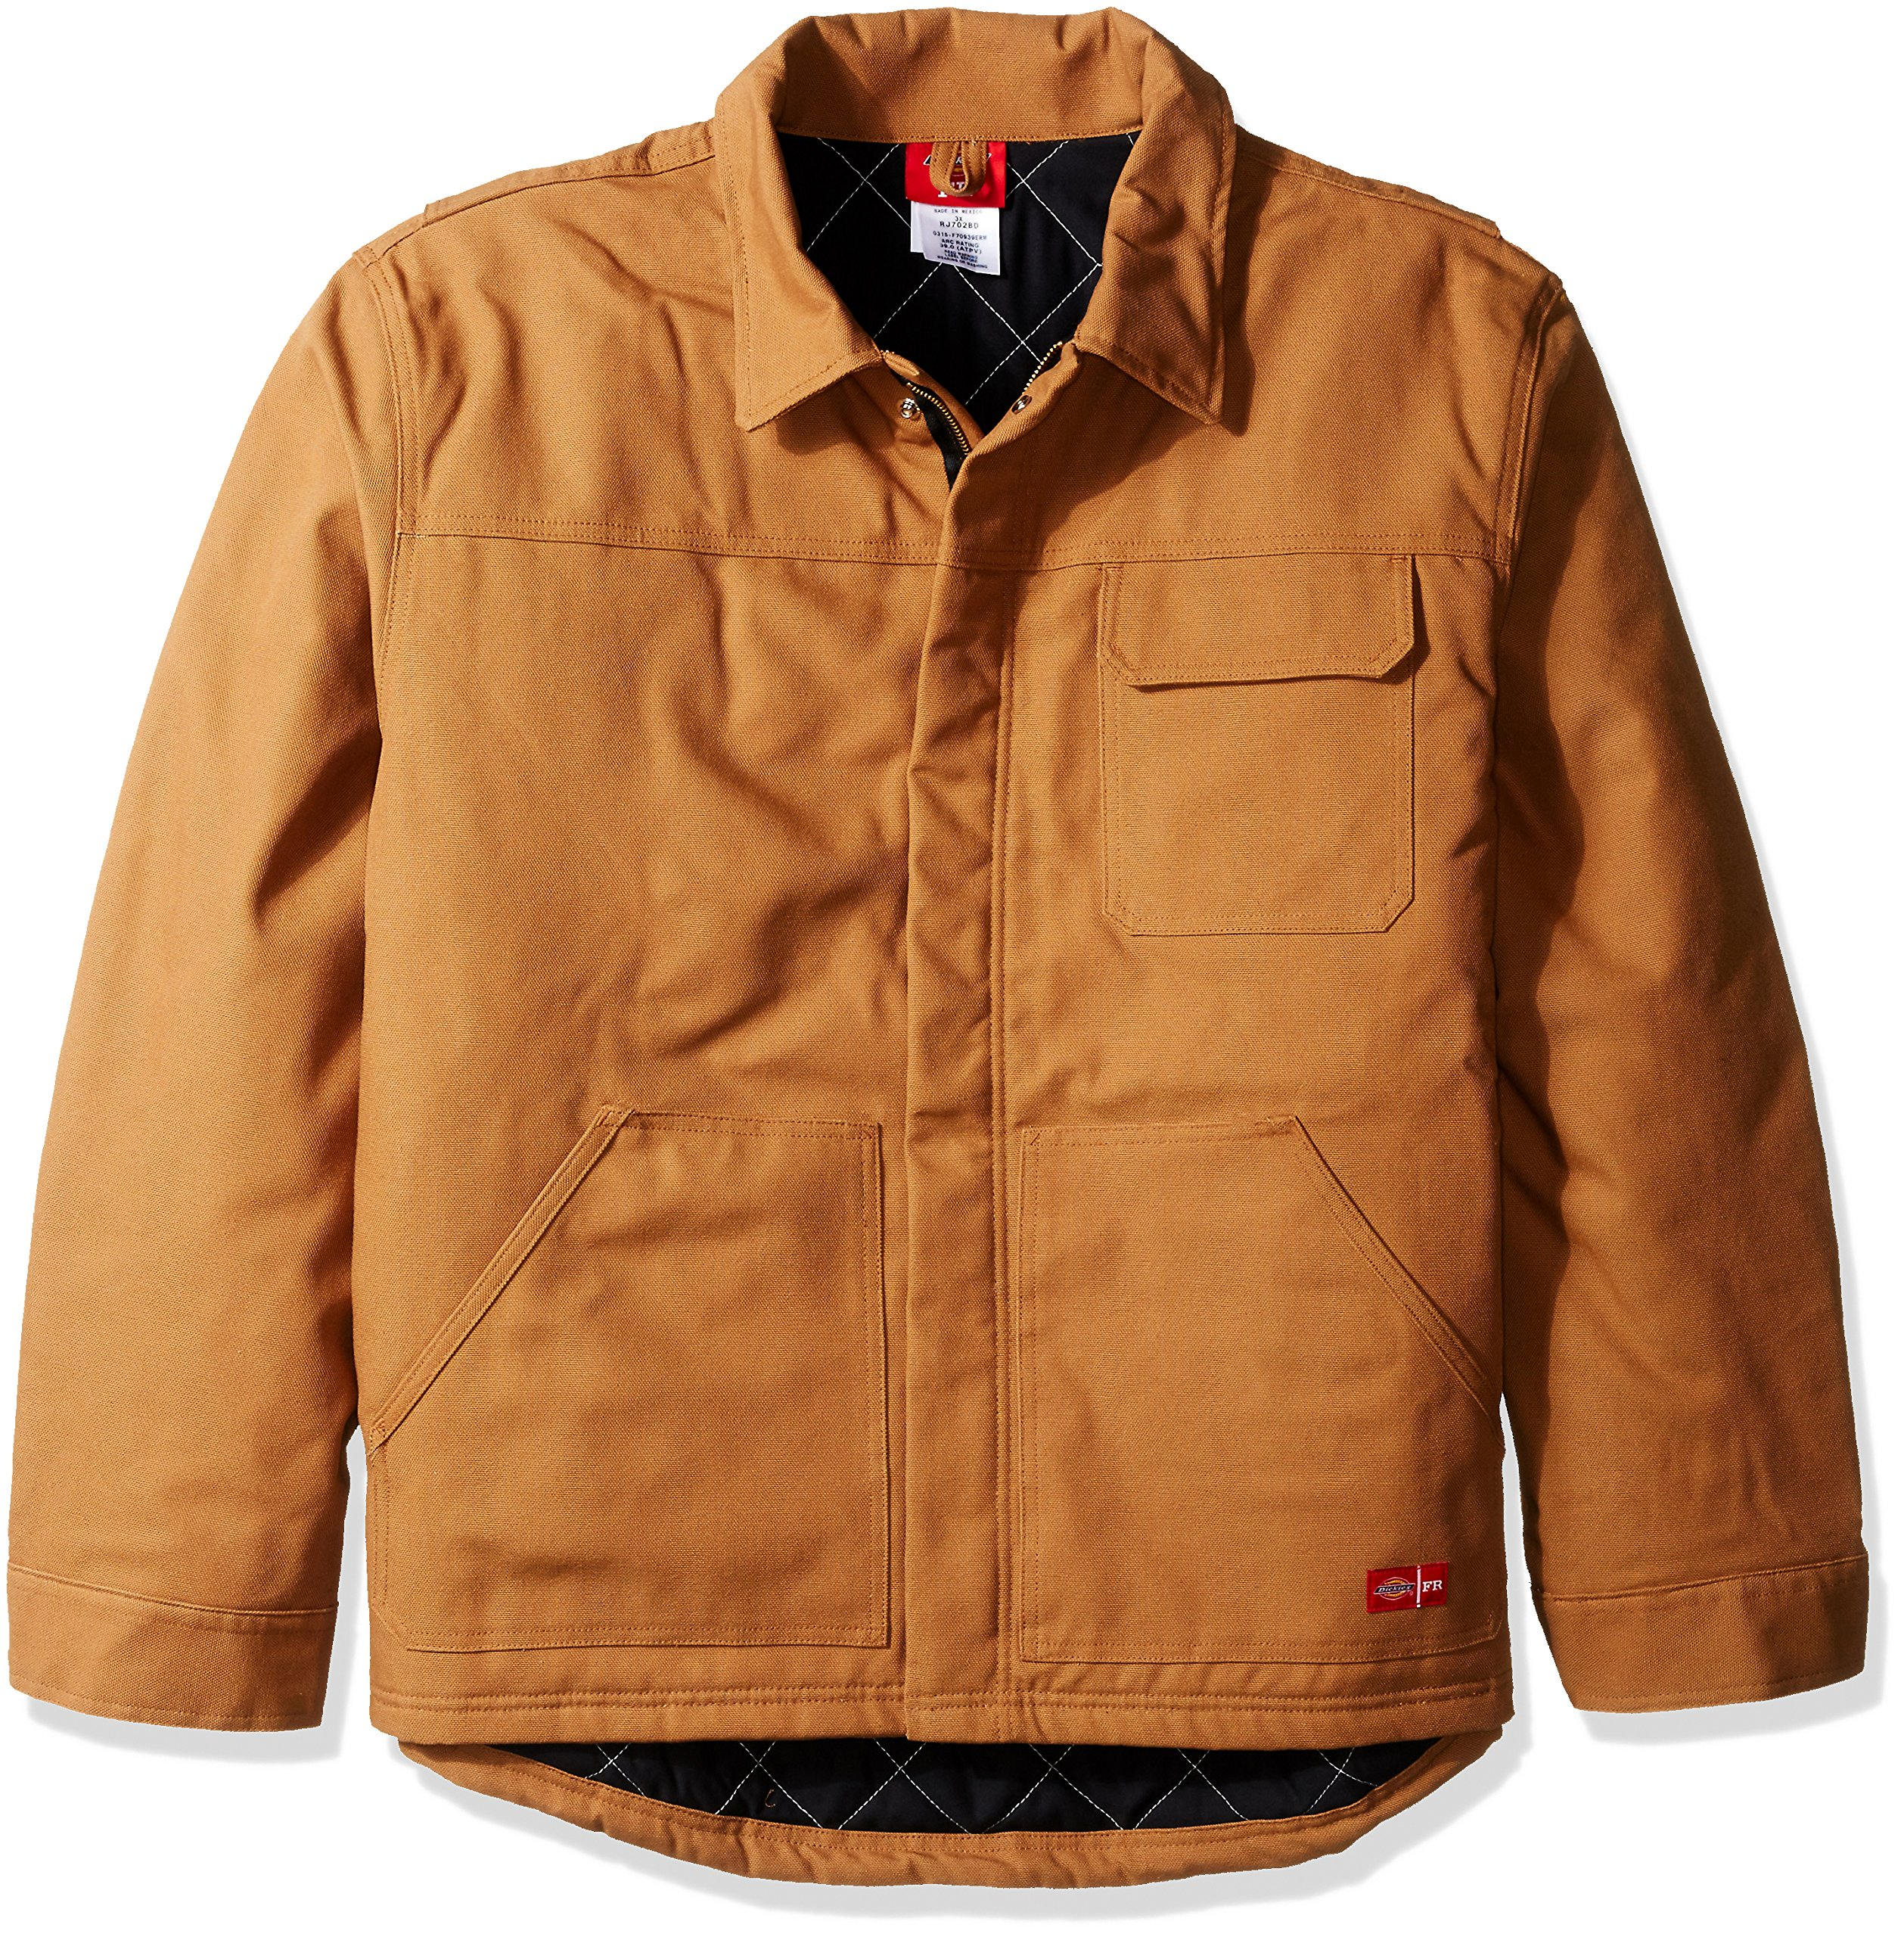 Dickies Men's Flame-Resistant Insulated Jacket Big, Brown Duck, 3X